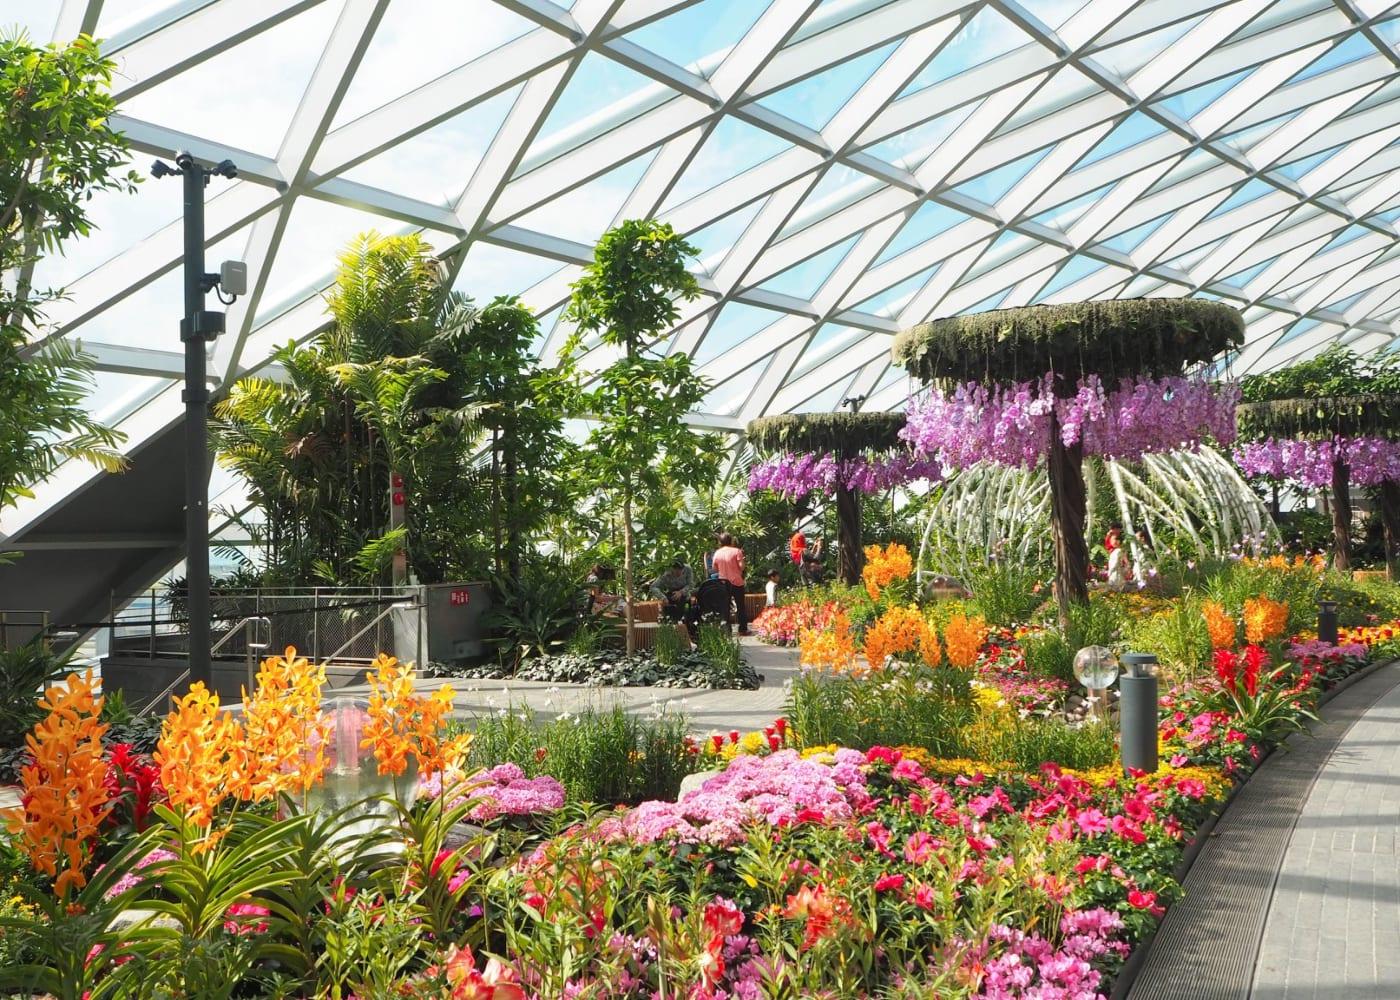 canopy park petal garden